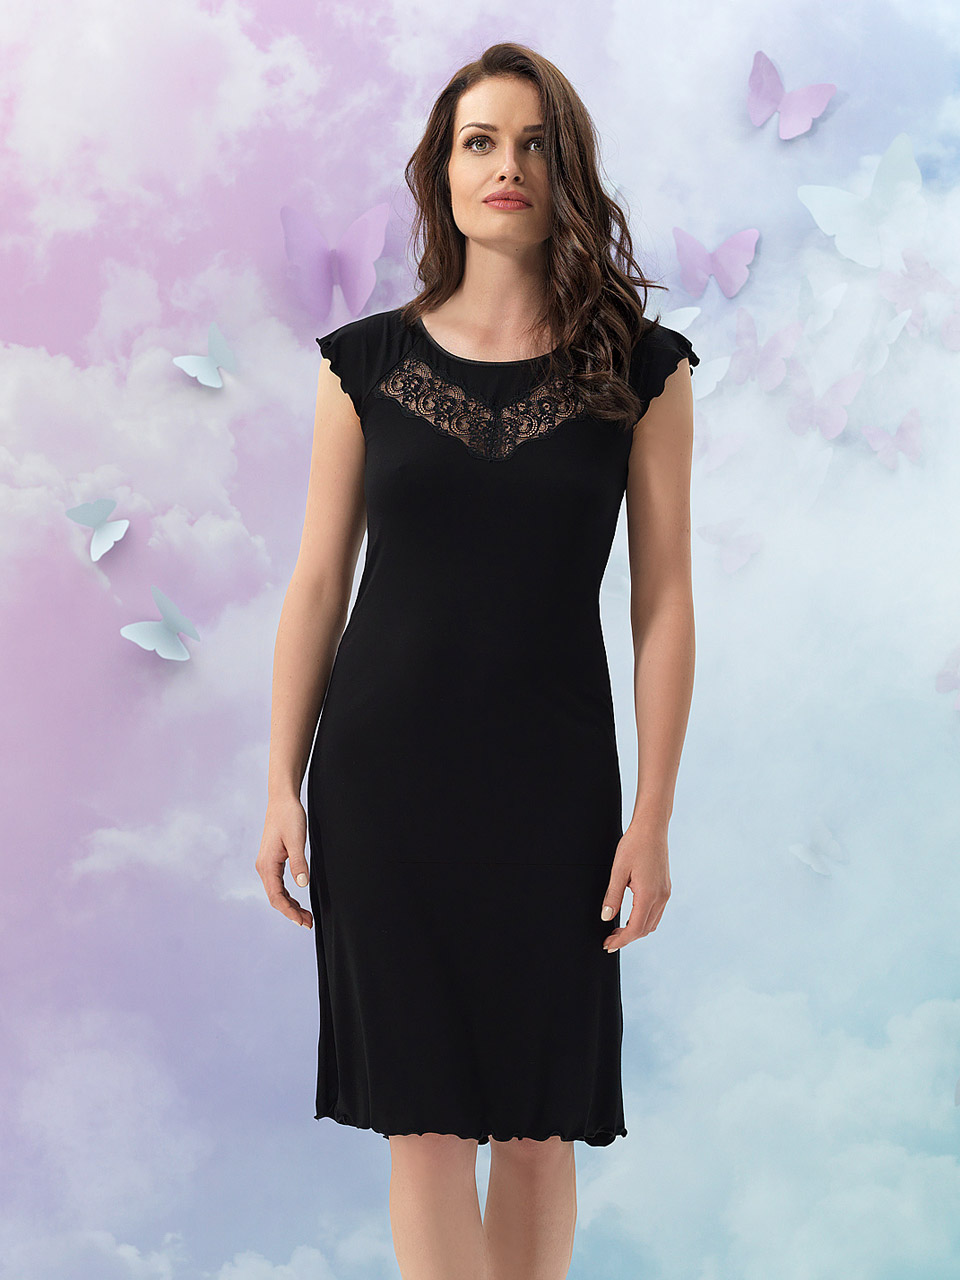 Leila 2940 Camicia da notte<br />01 Ivory, 02 Black, 55 Pearl